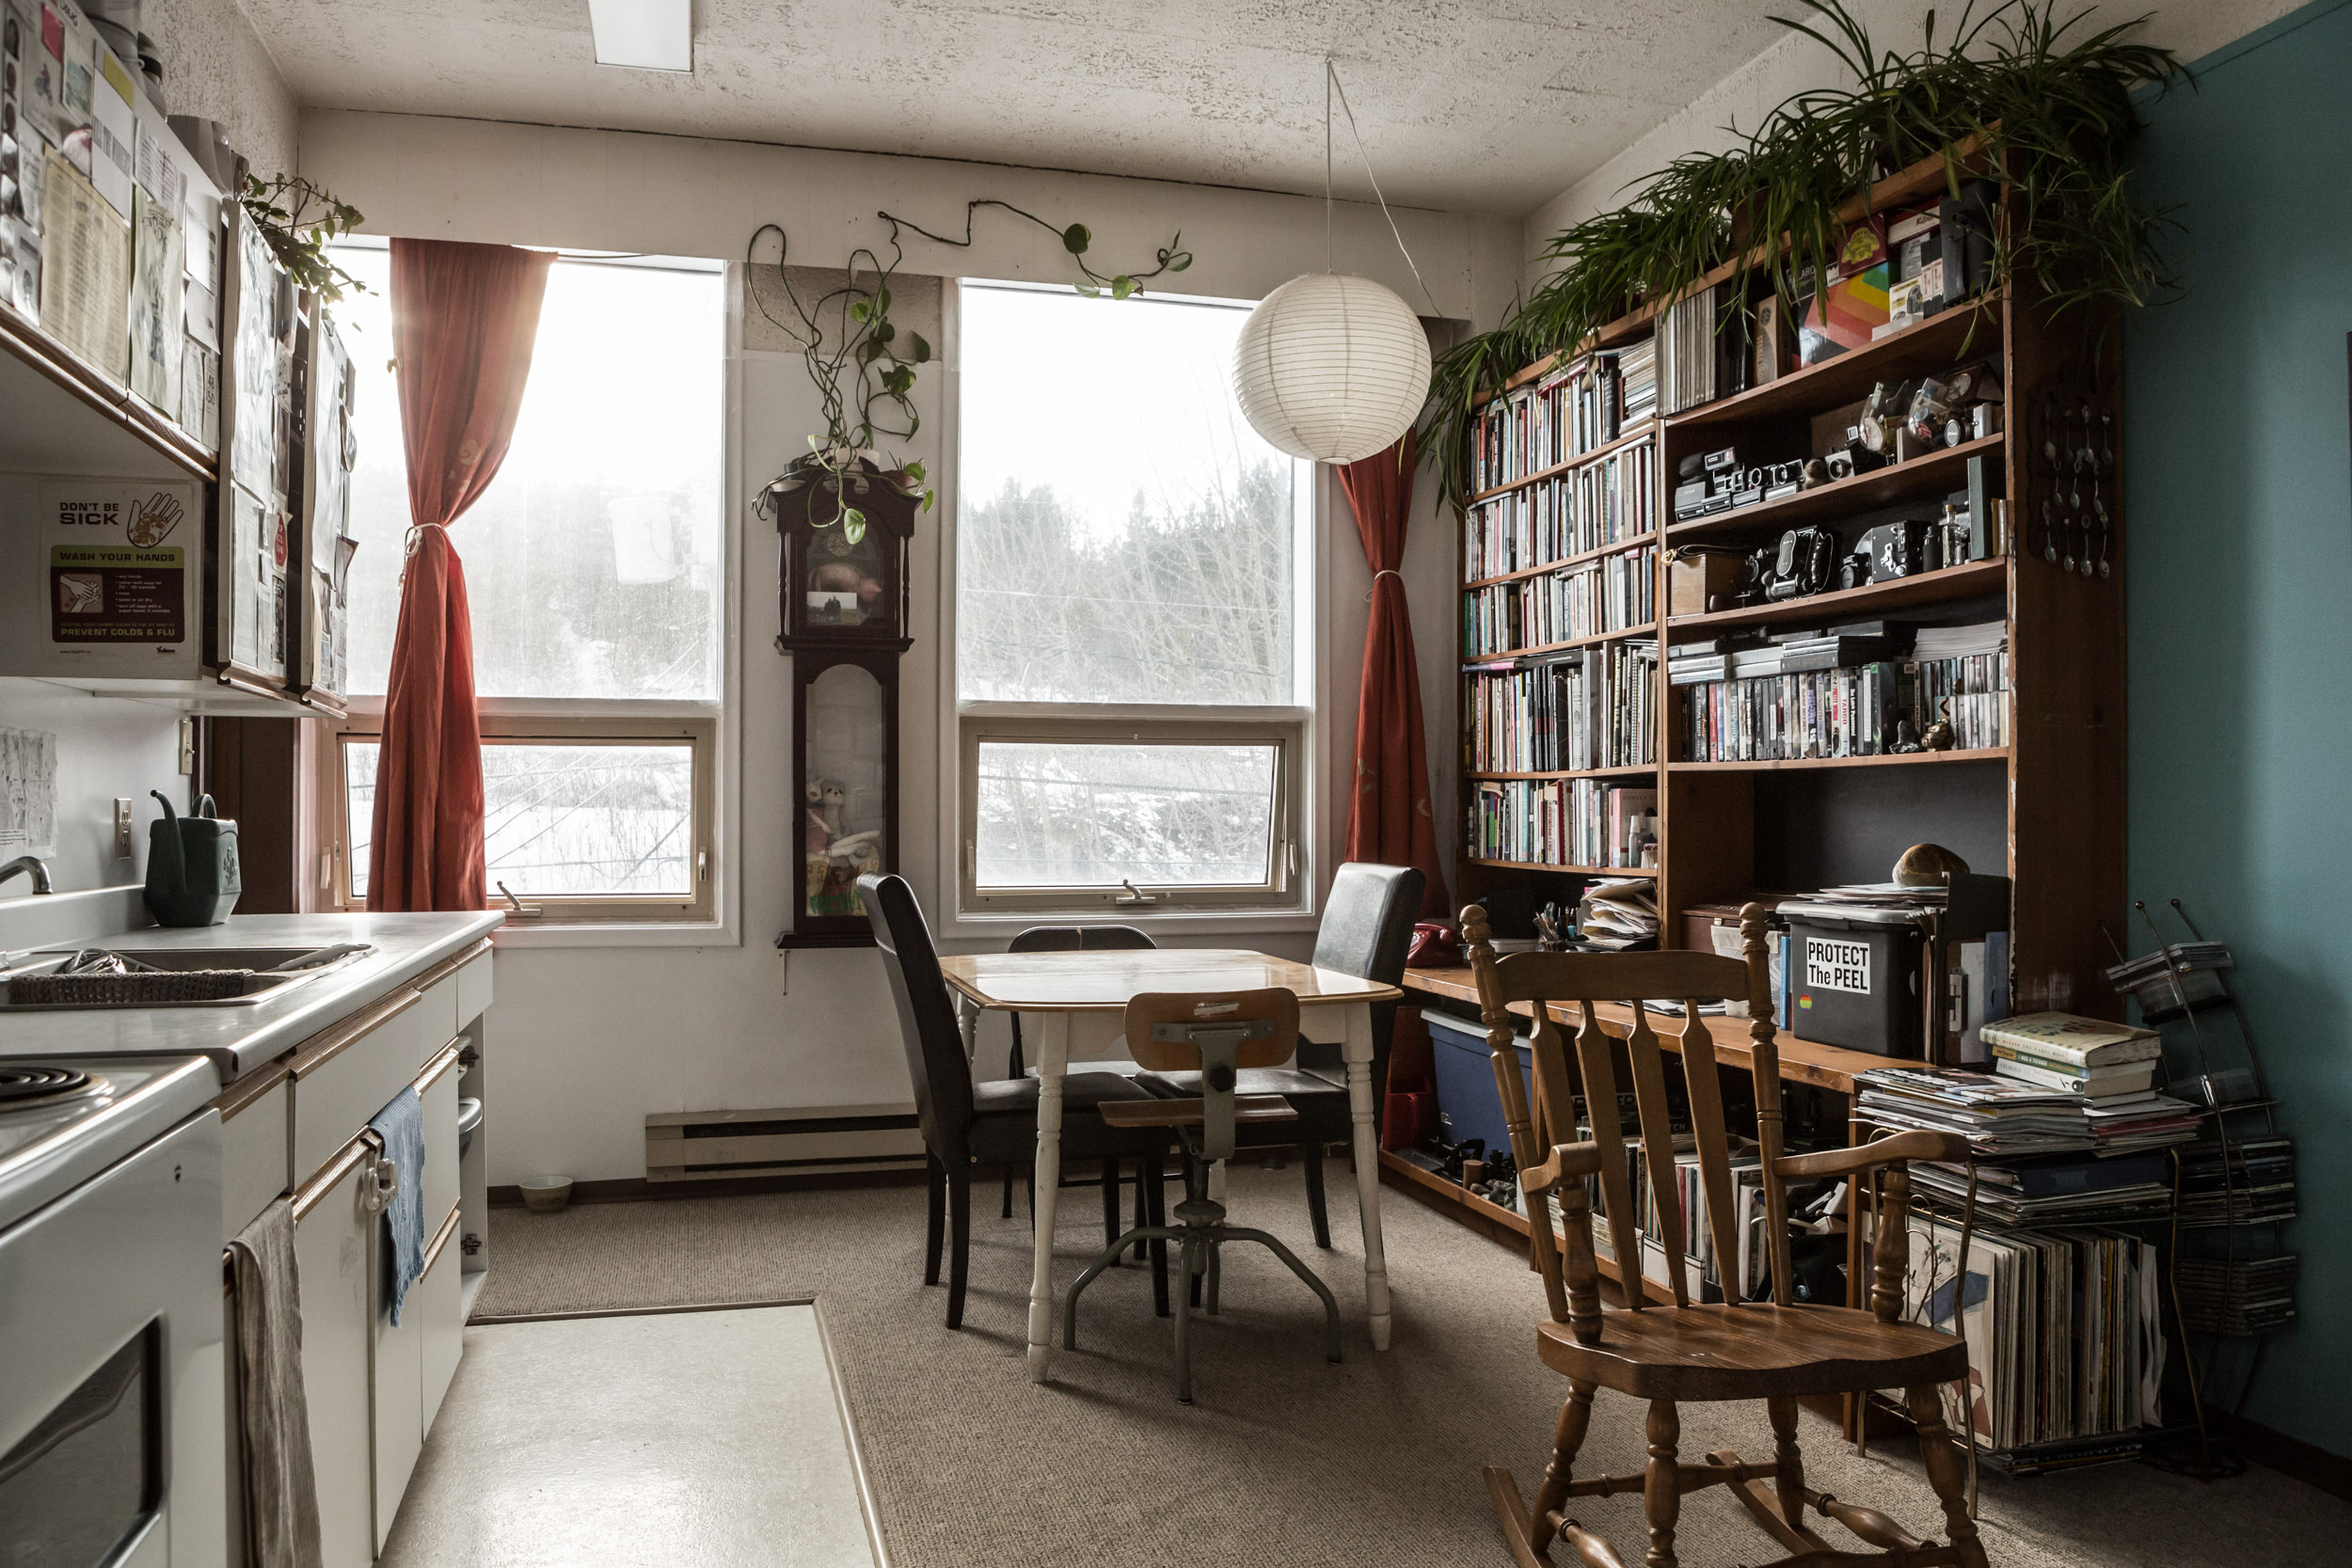 20130417_Radar_Apartments_GBP_010.jpg